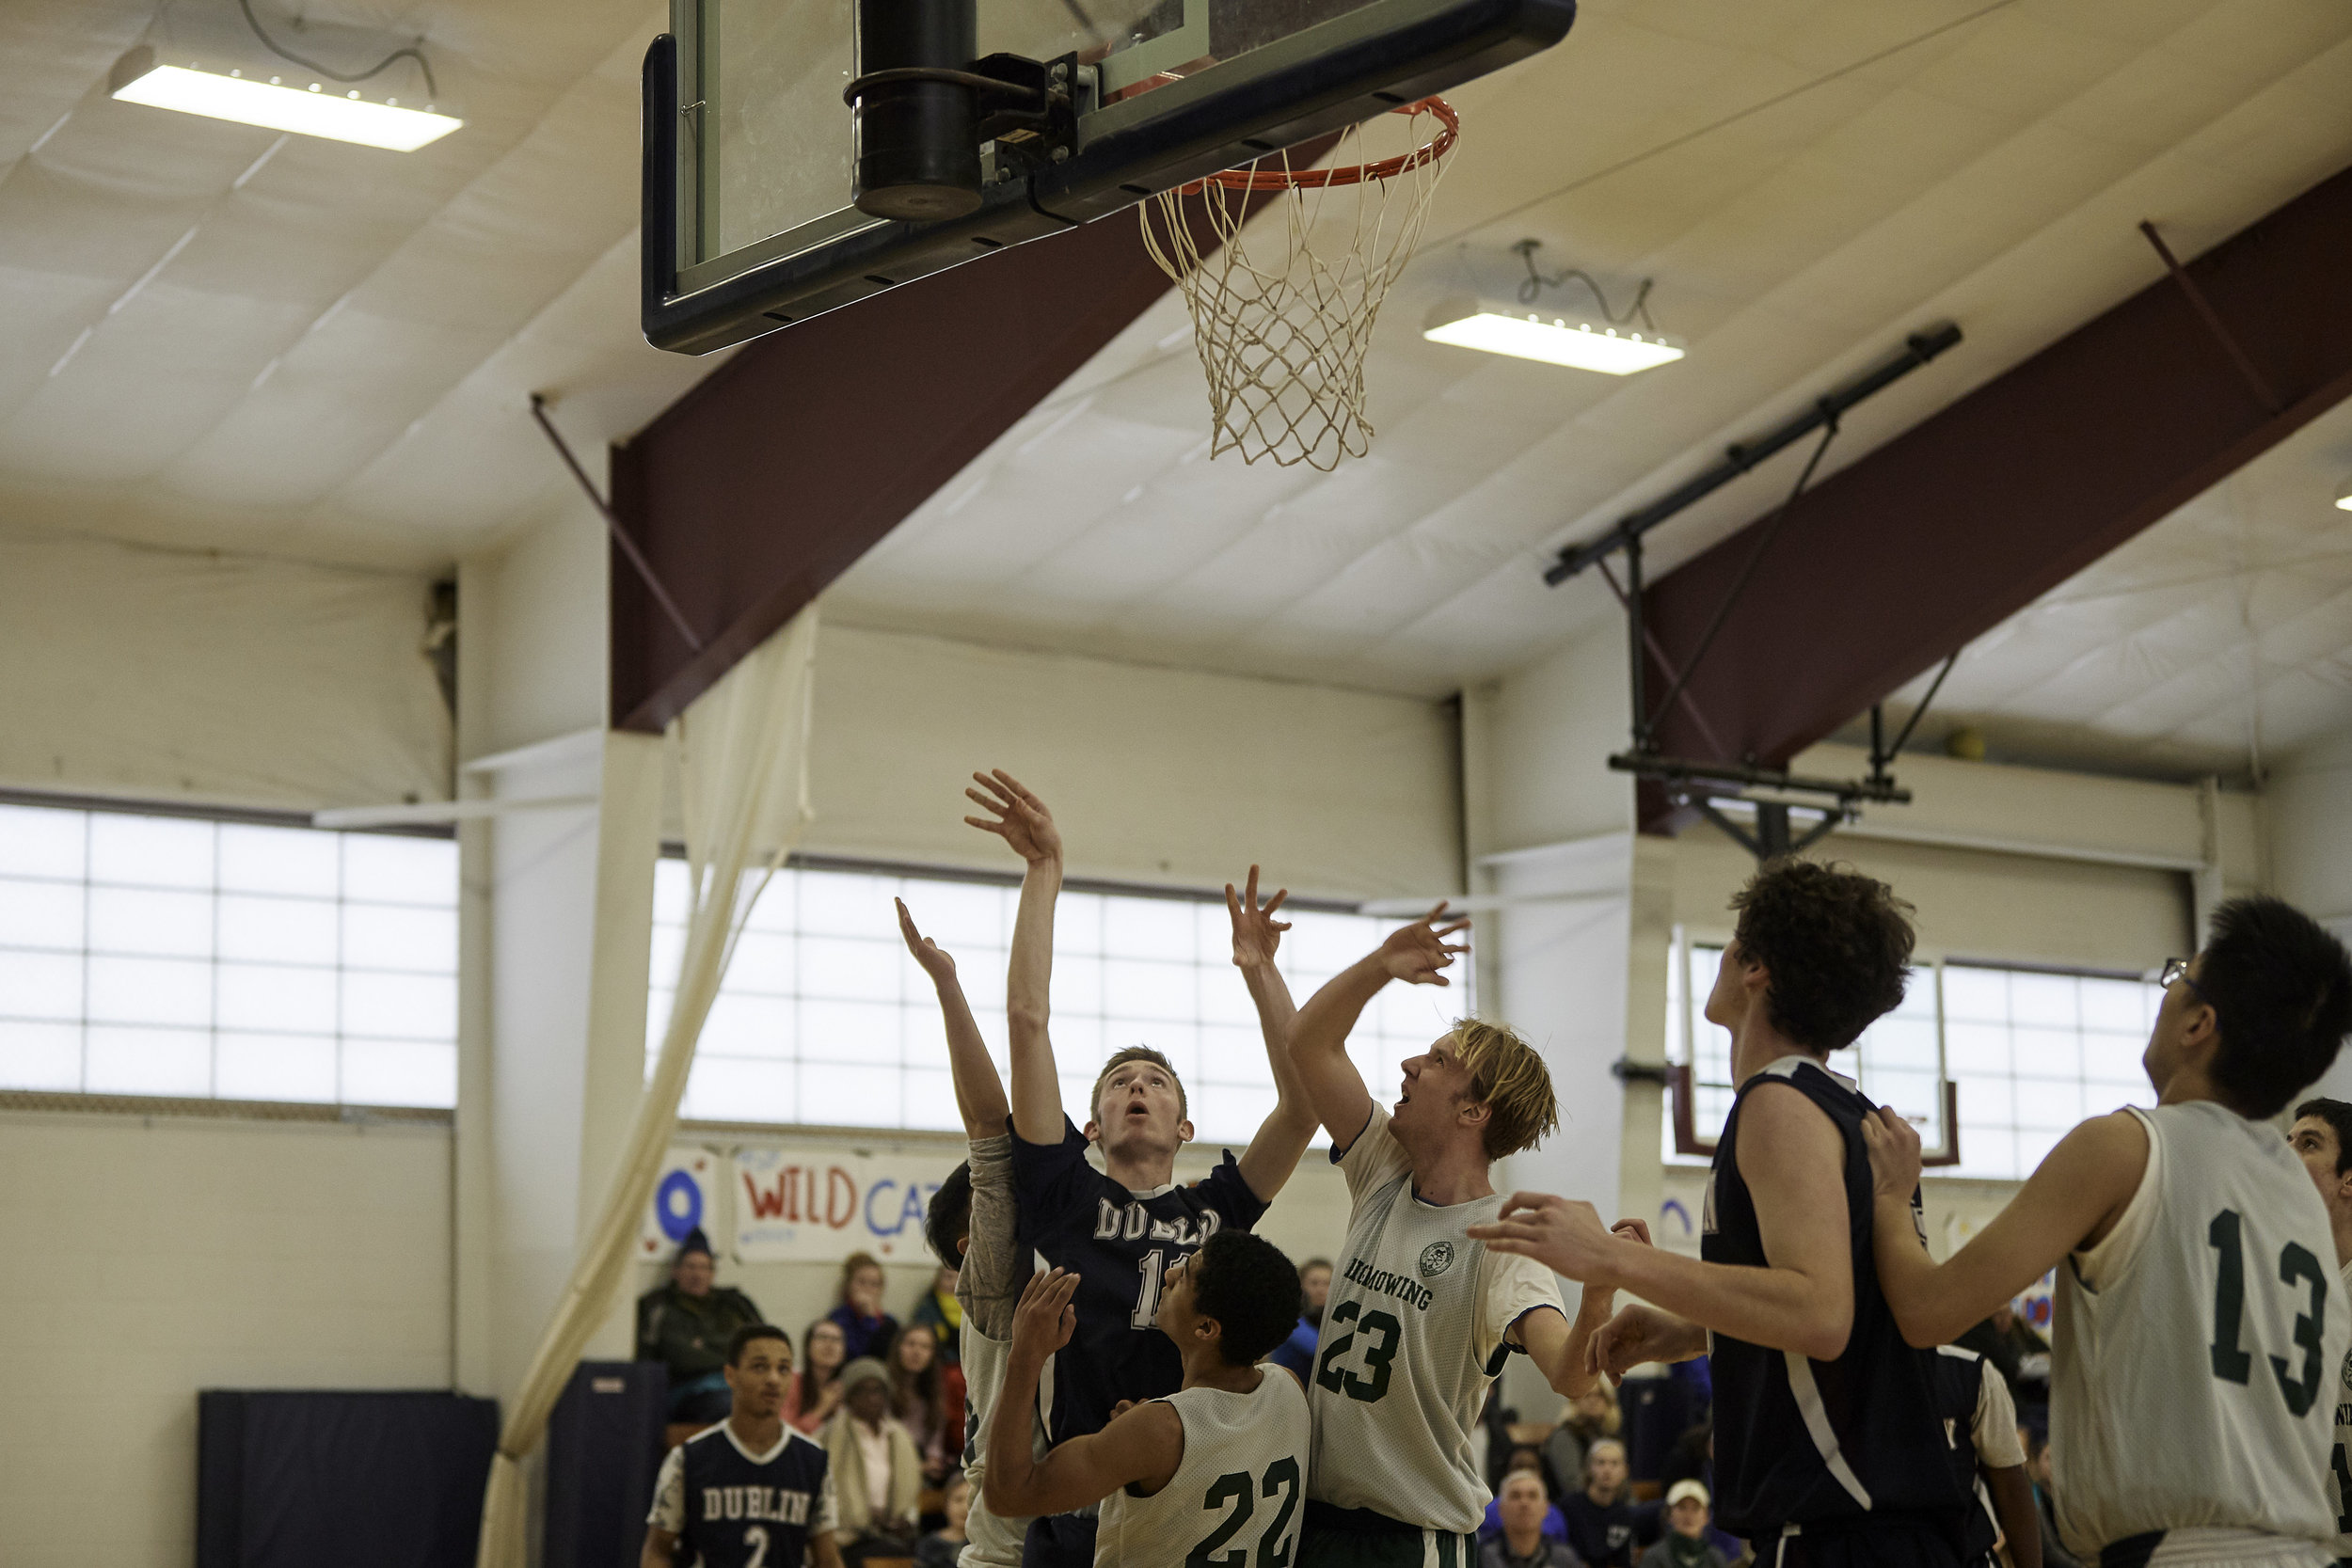 Boys Varsity Basketball vs High Mowing School - Feb 02 2019 - 0057.jpg